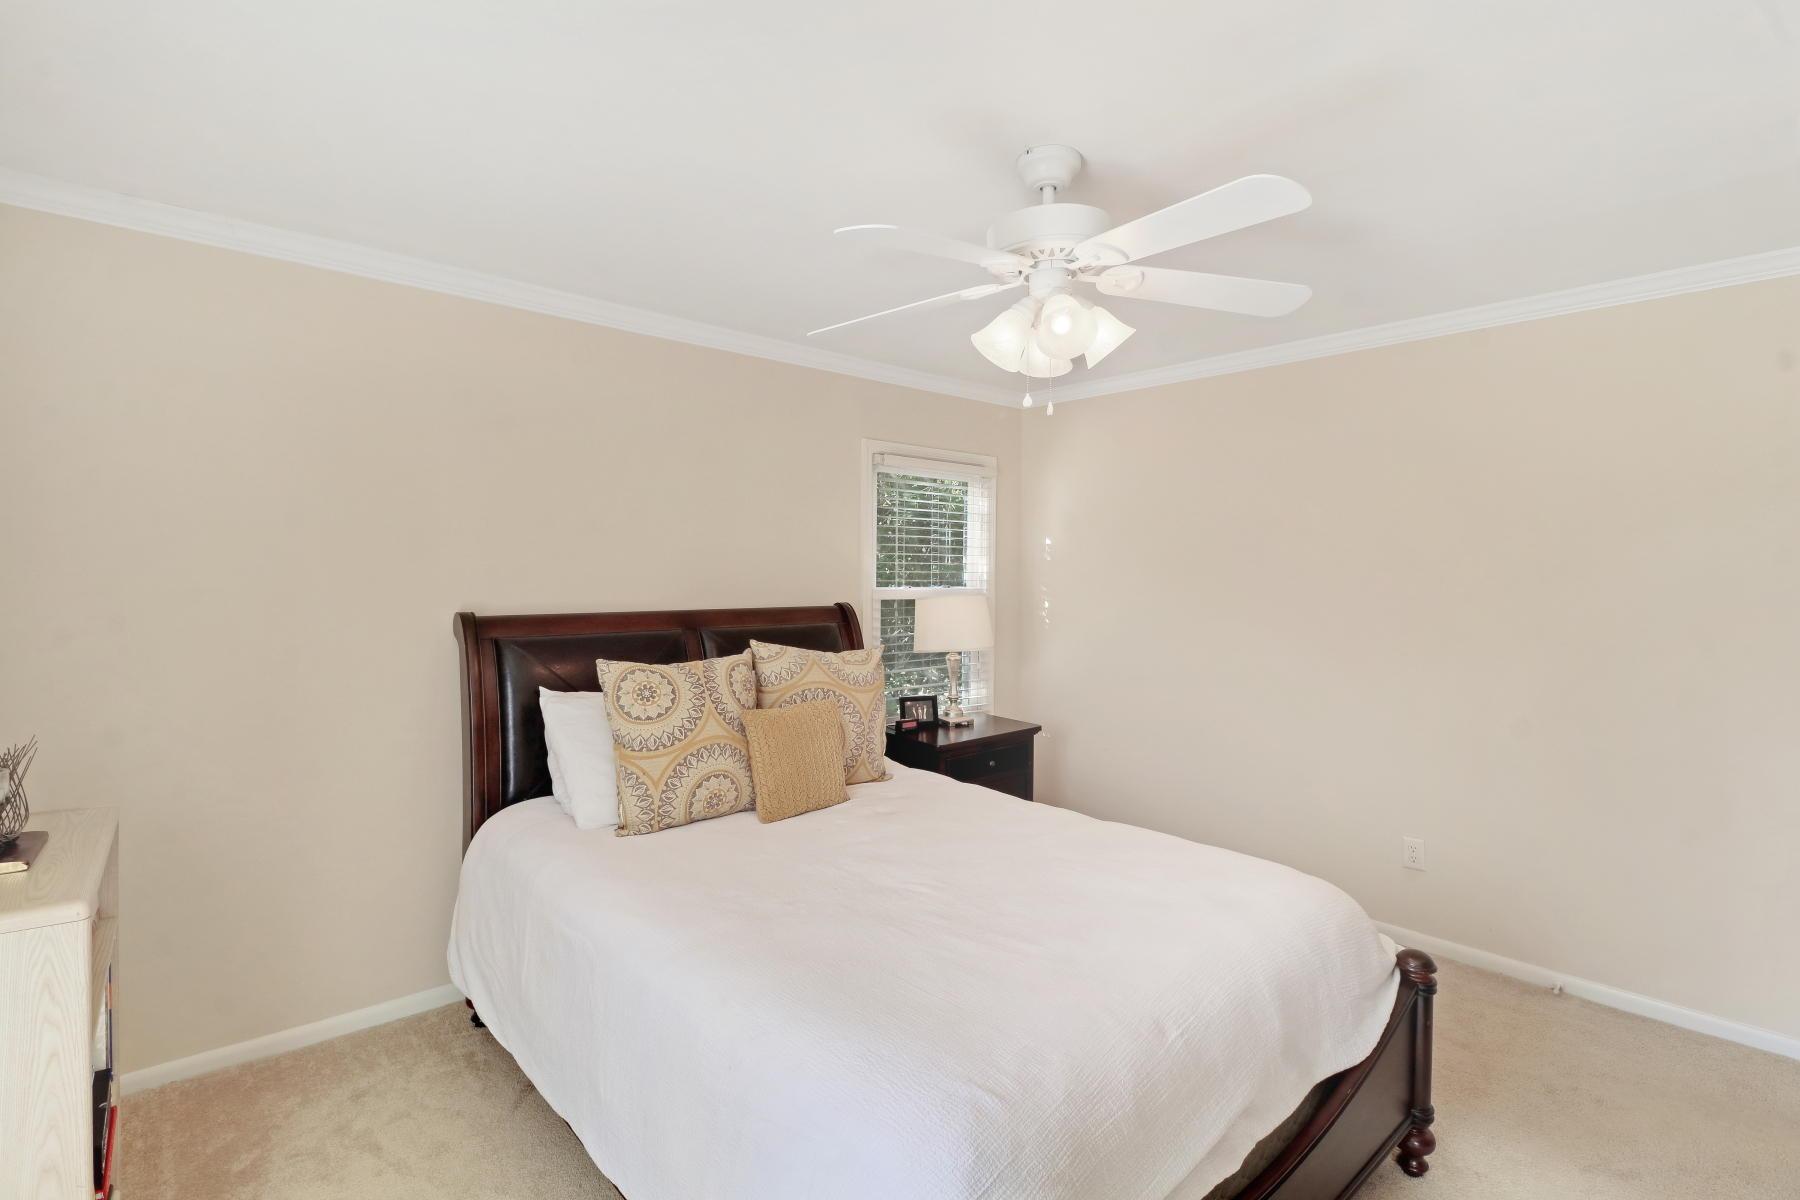 Harrison Acres Homes For Sale - 51 Markfield, Charleston, SC - 18